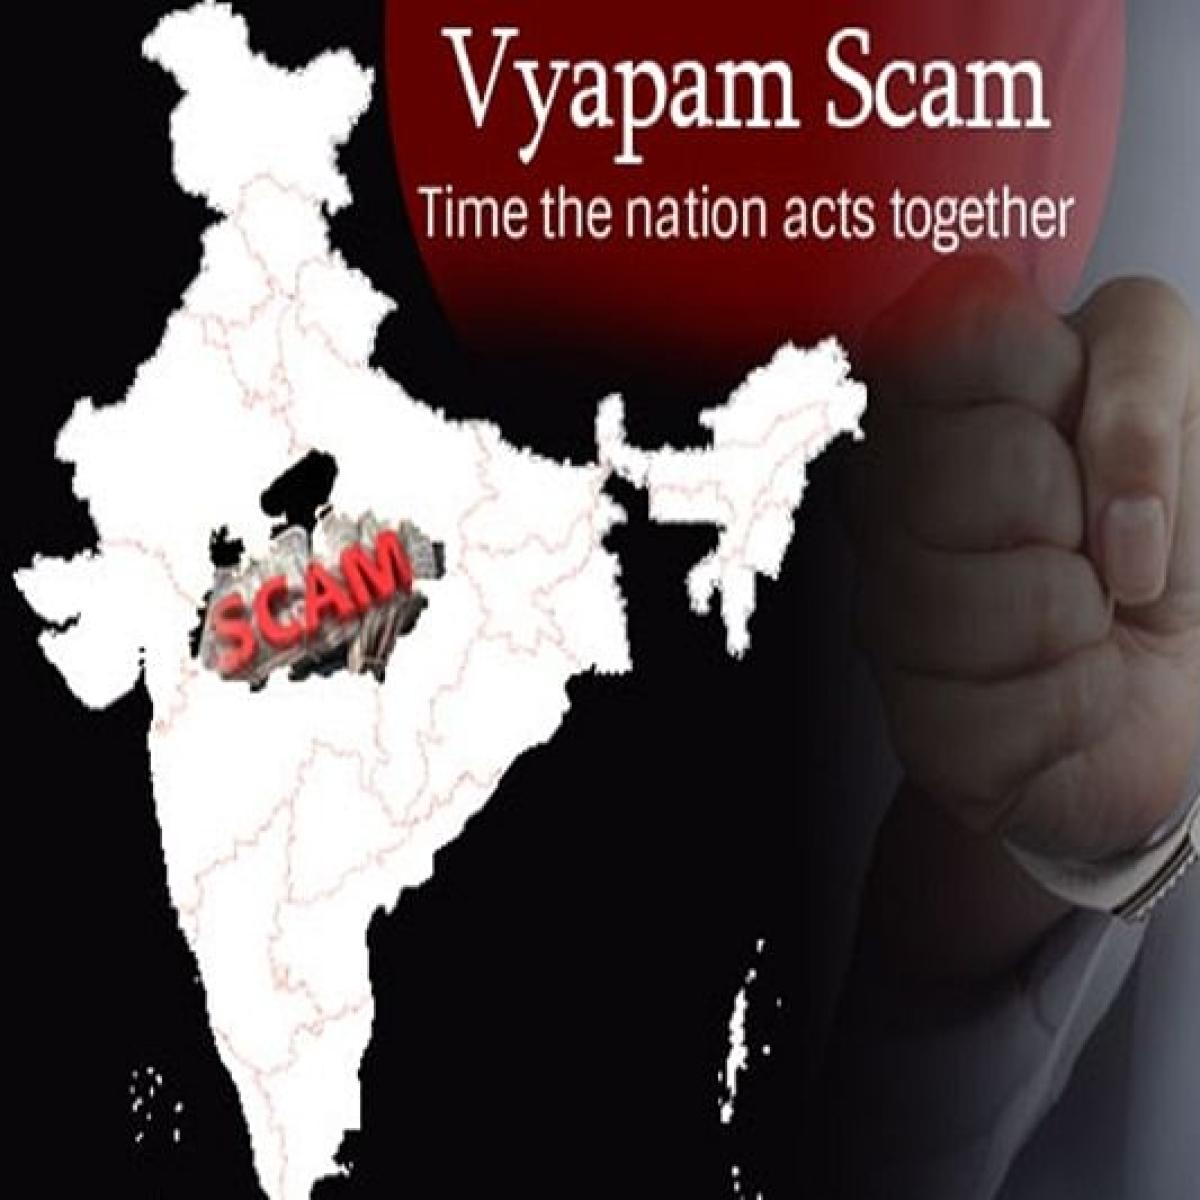 Madhya Pradesh: Vyapam perversion raises its ugly head again